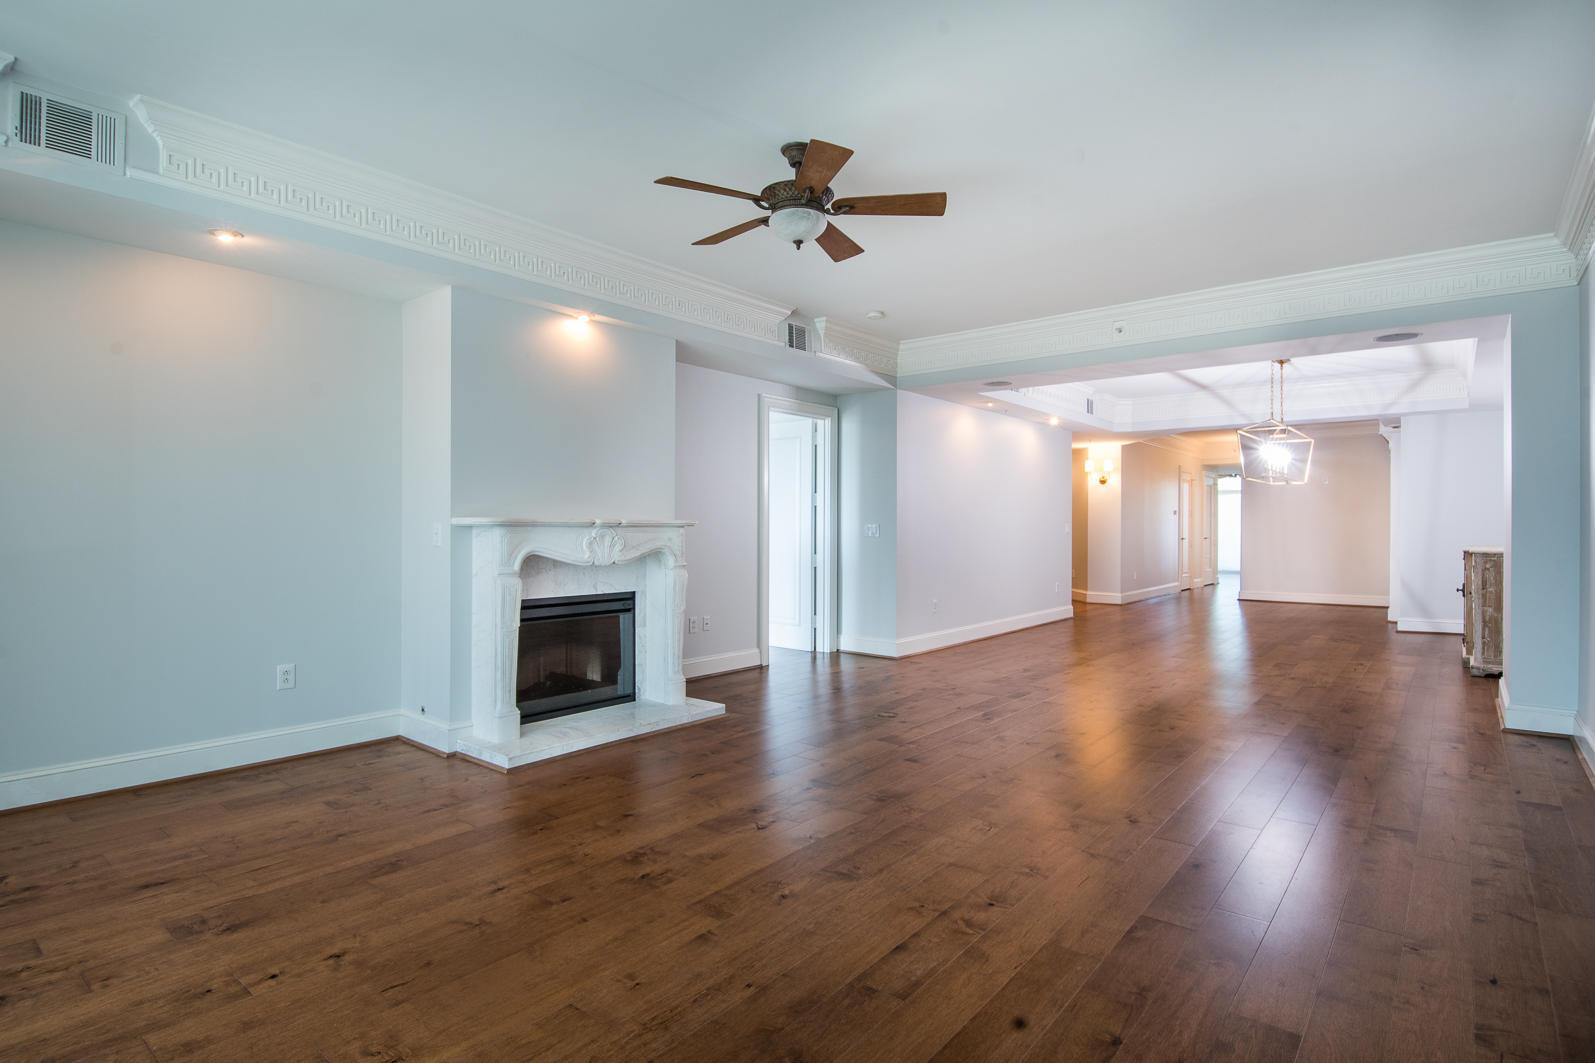 Renaissance On Chas Harbor Homes For Sale - 144 Plaza, Mount Pleasant, SC - 12